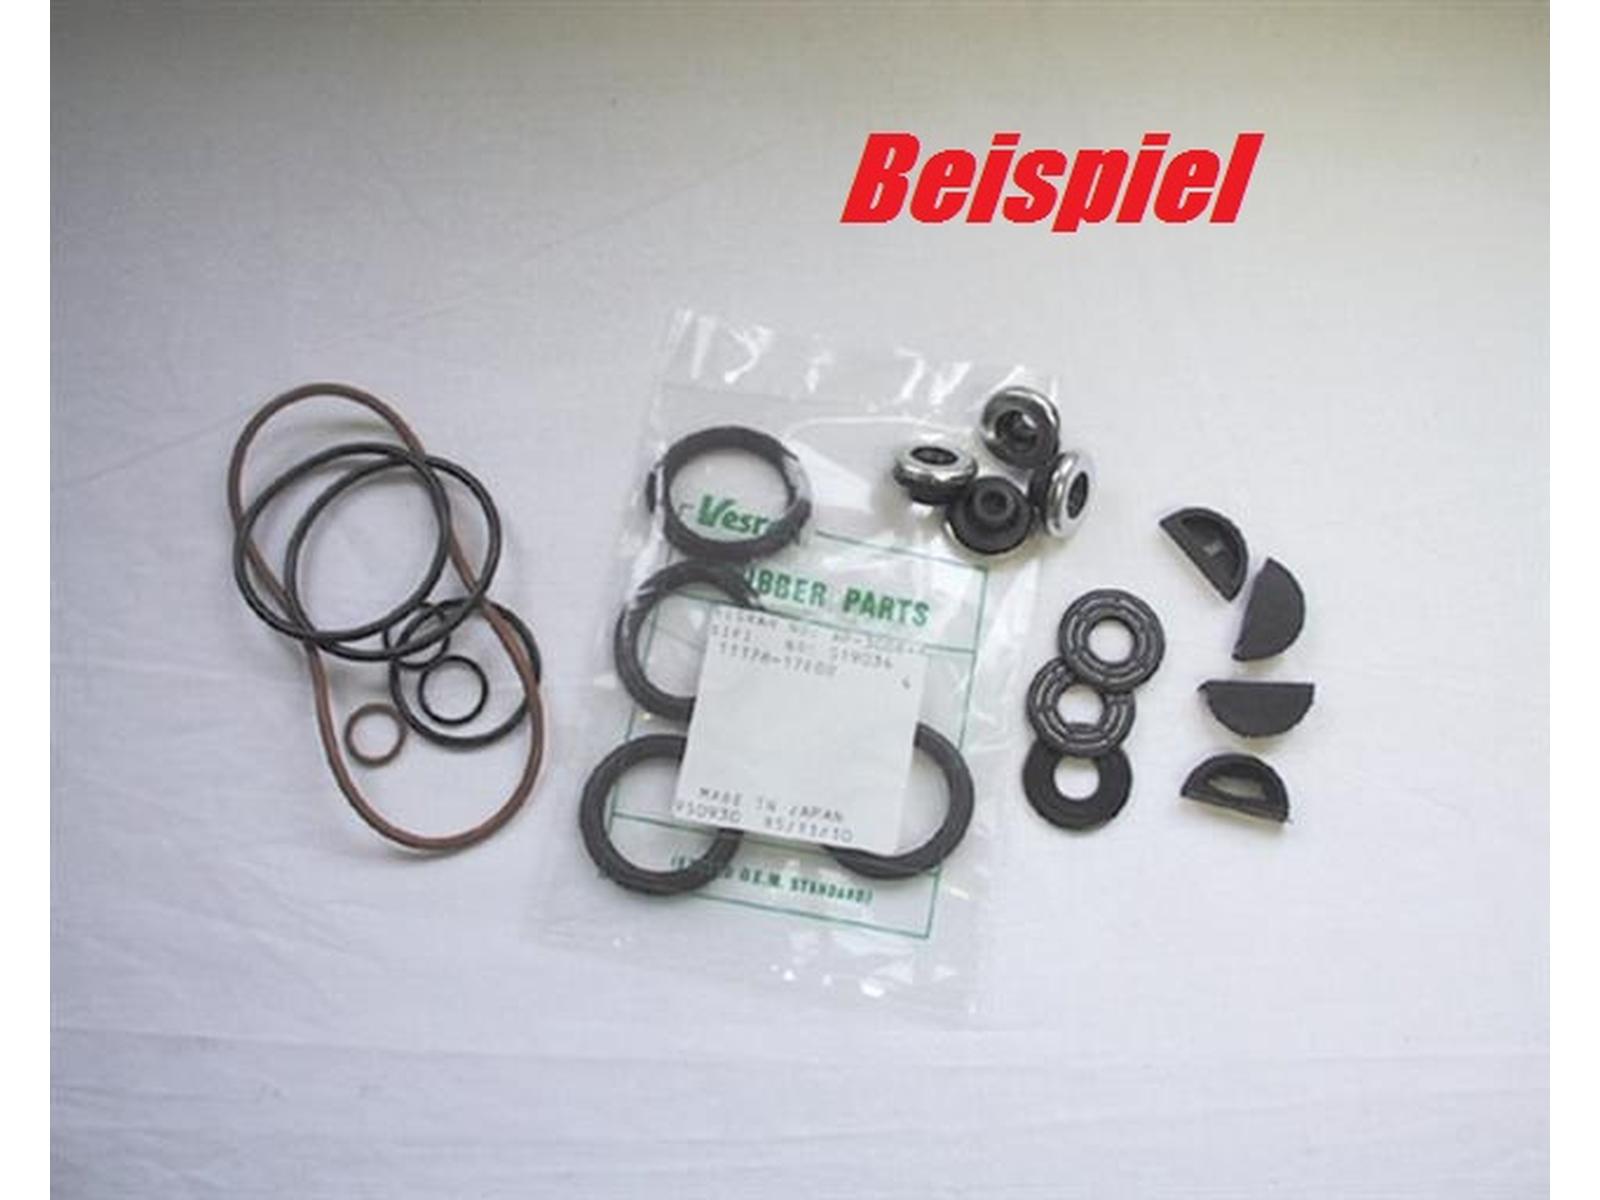 Ventildeckeldichtung Kawasaki Z 750 Ltd 2 Zyl